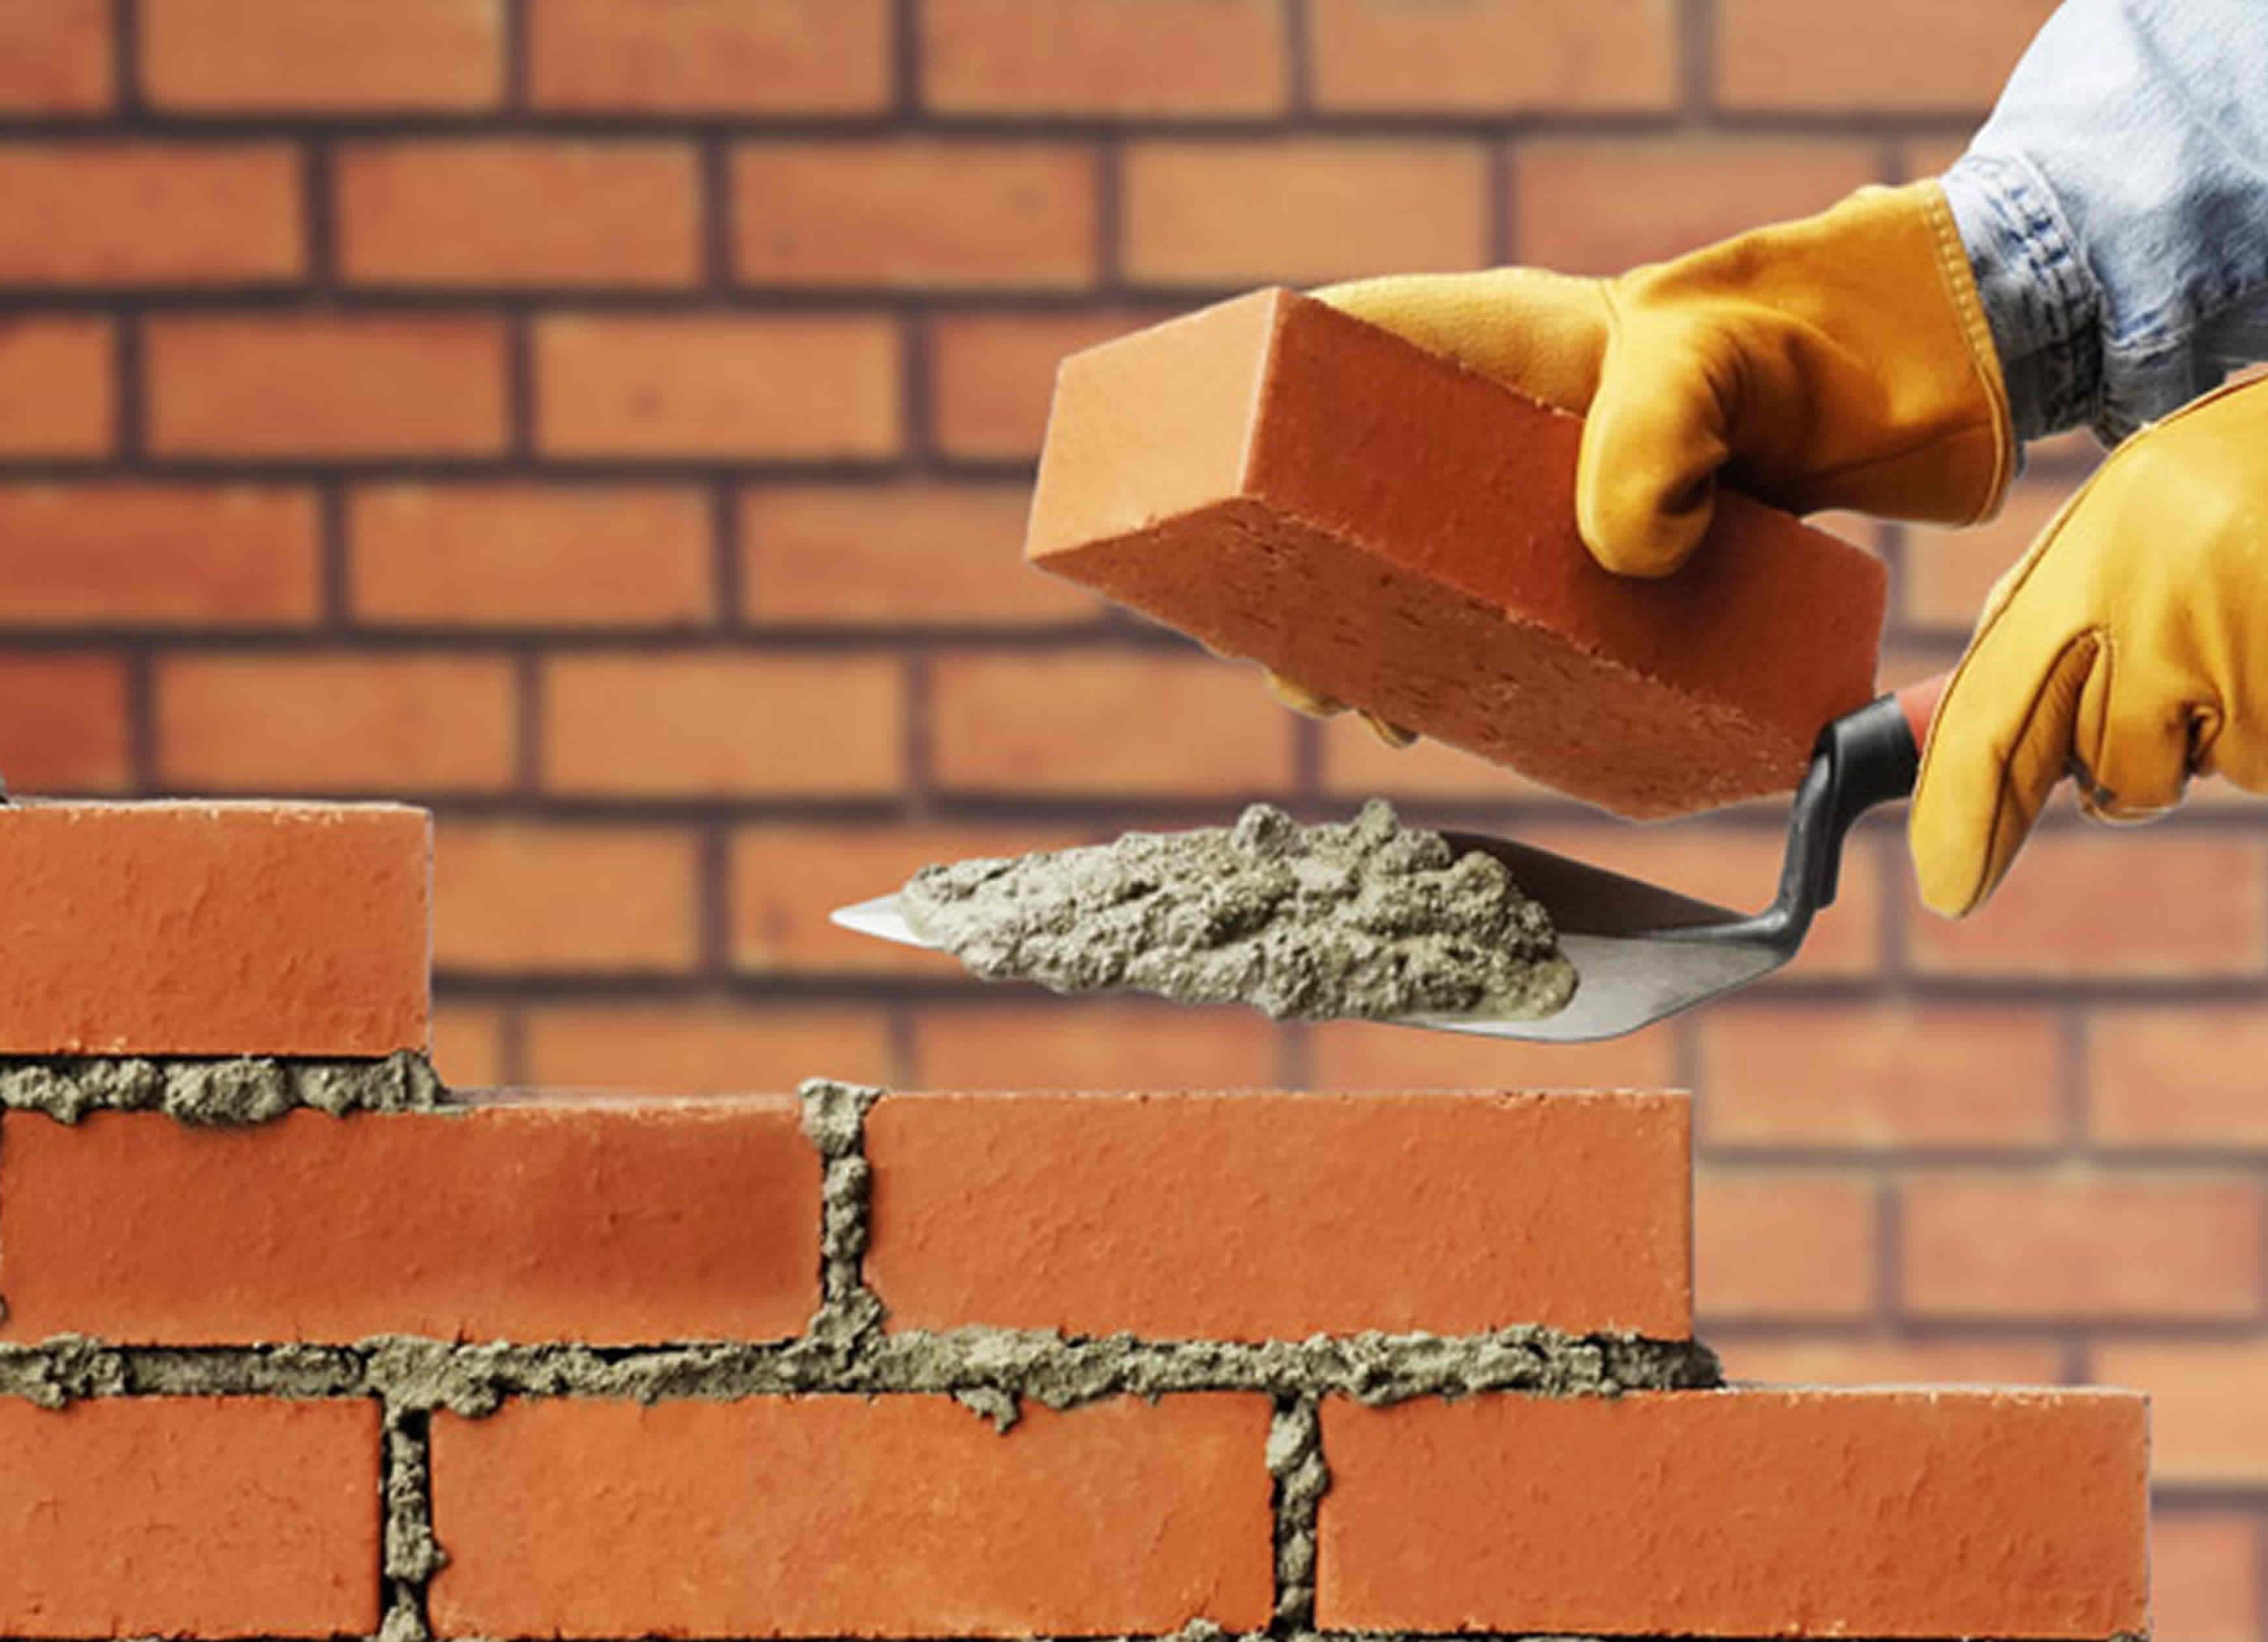 Mi vida en construcci n e625 - Construccion de una casa ...